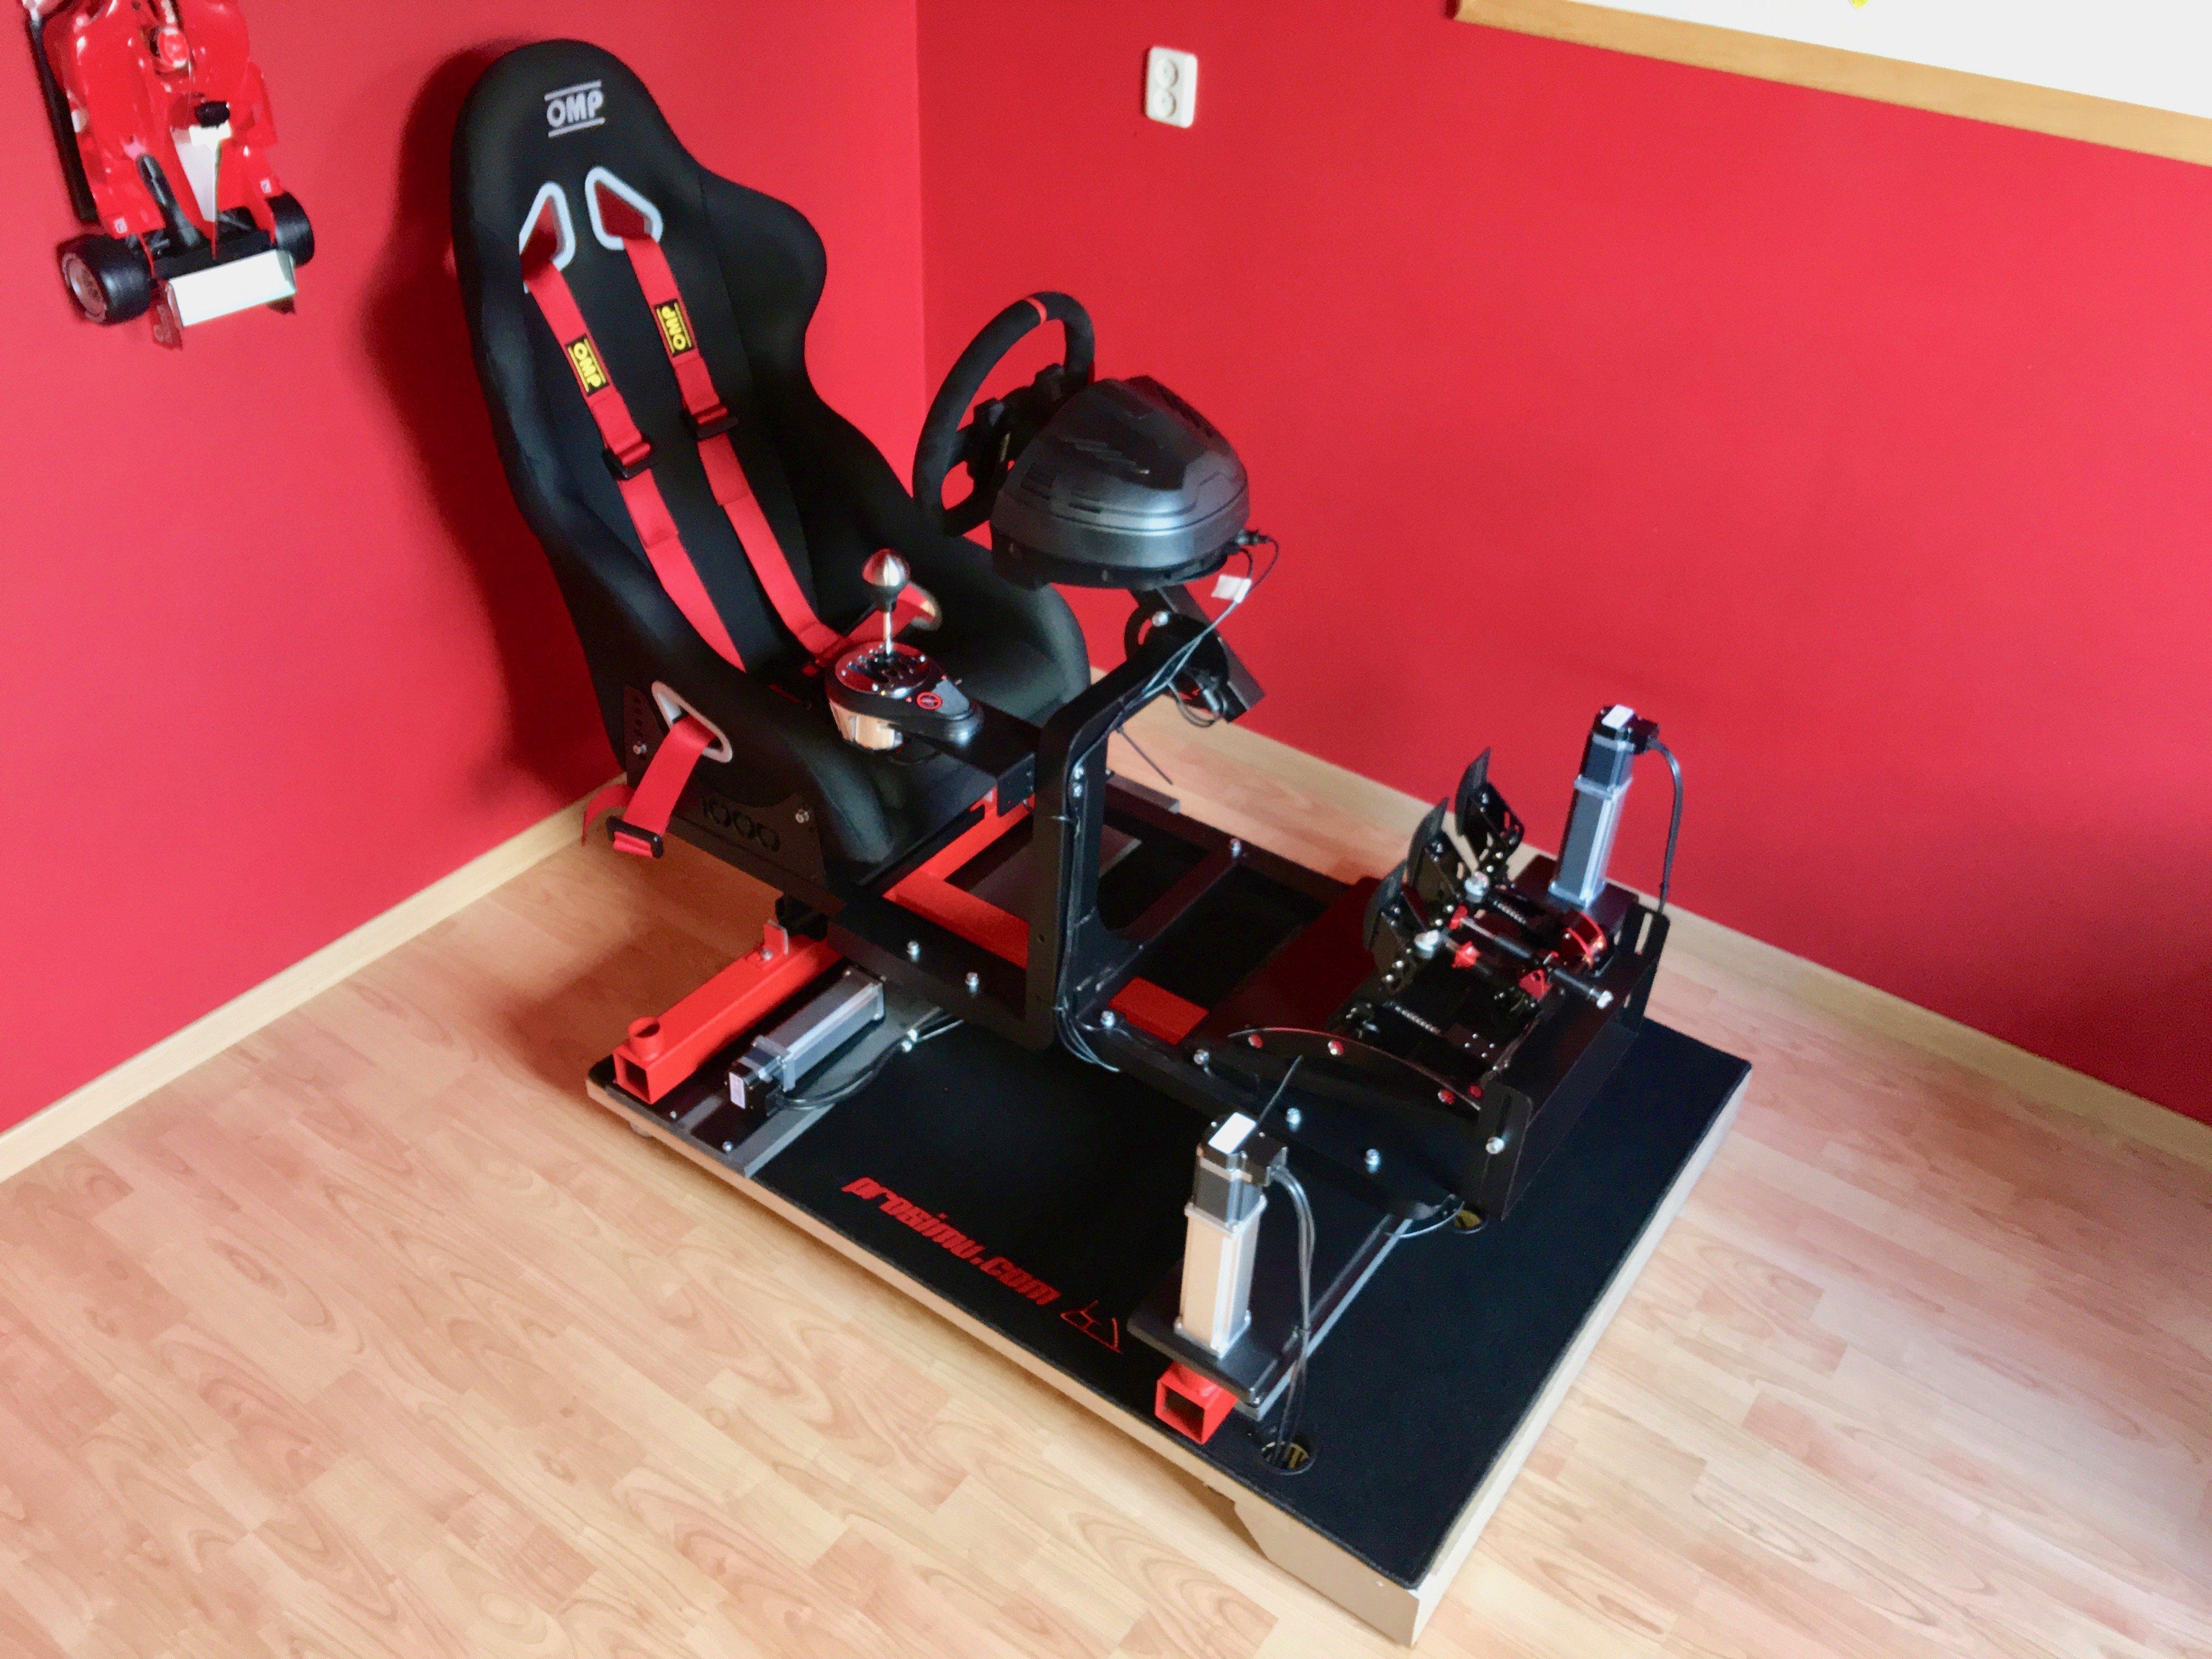 Review Prosimu T1000 3dof Motion Simulator Inside Sim